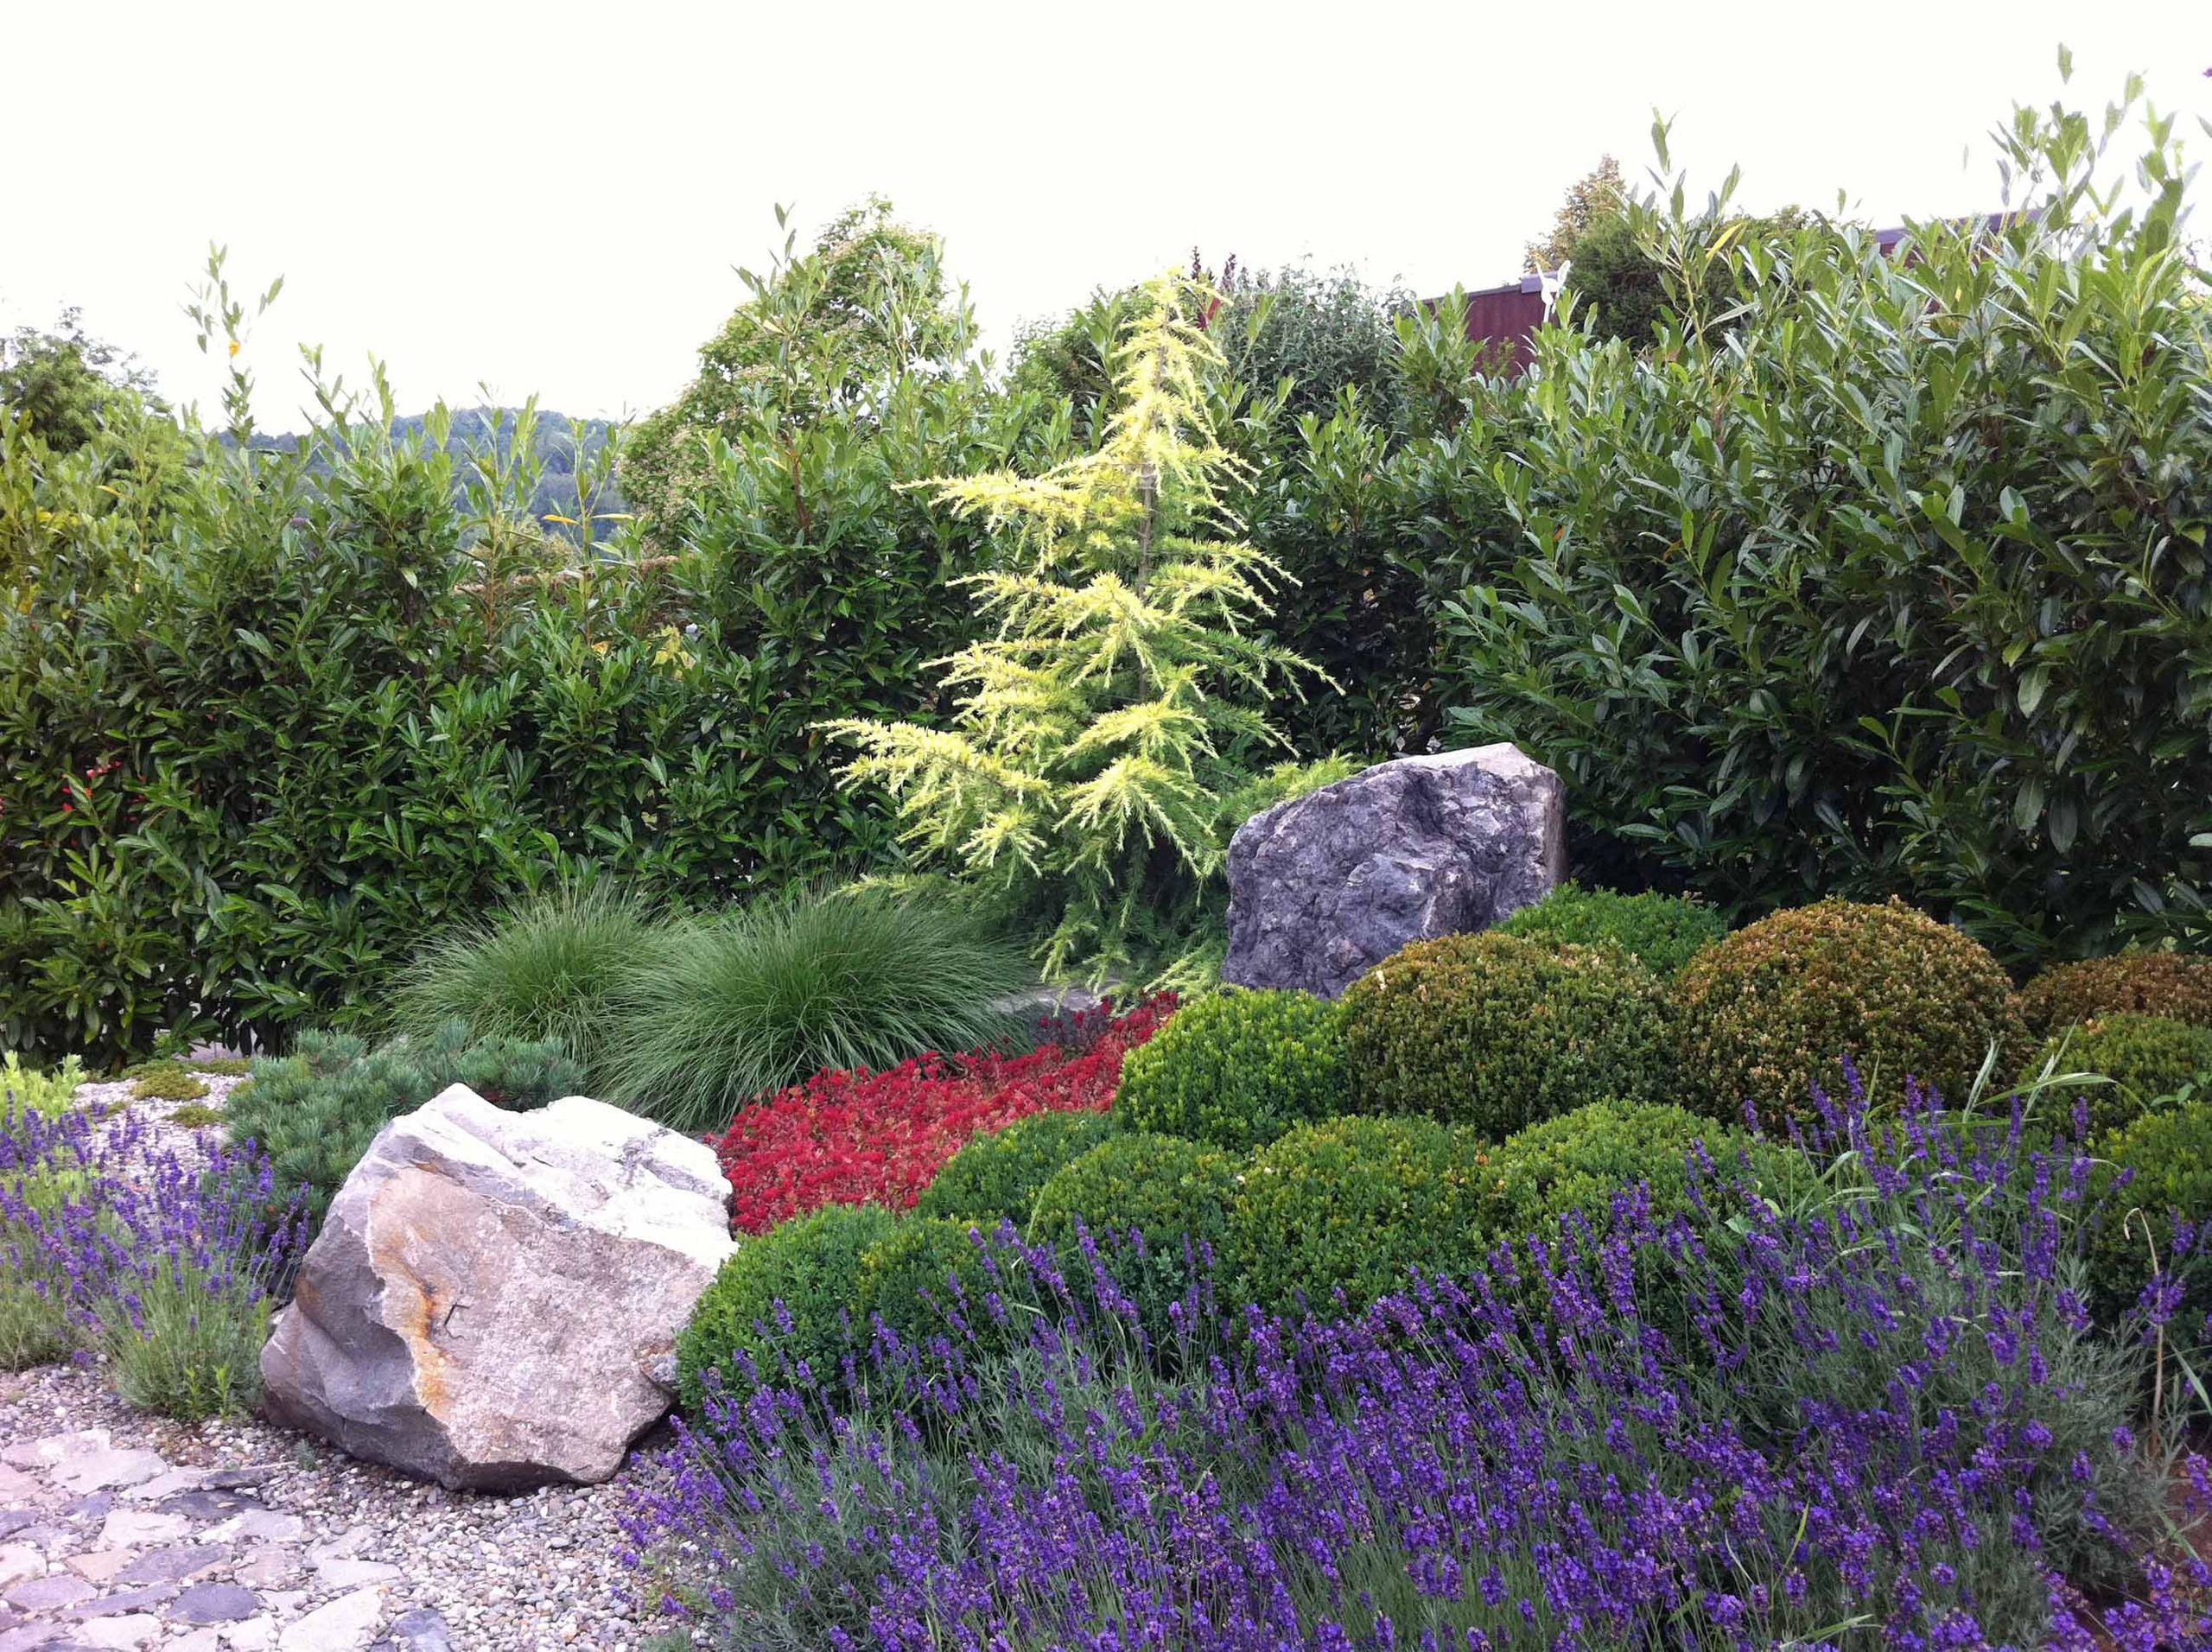 Villiger Gartenimpressionen